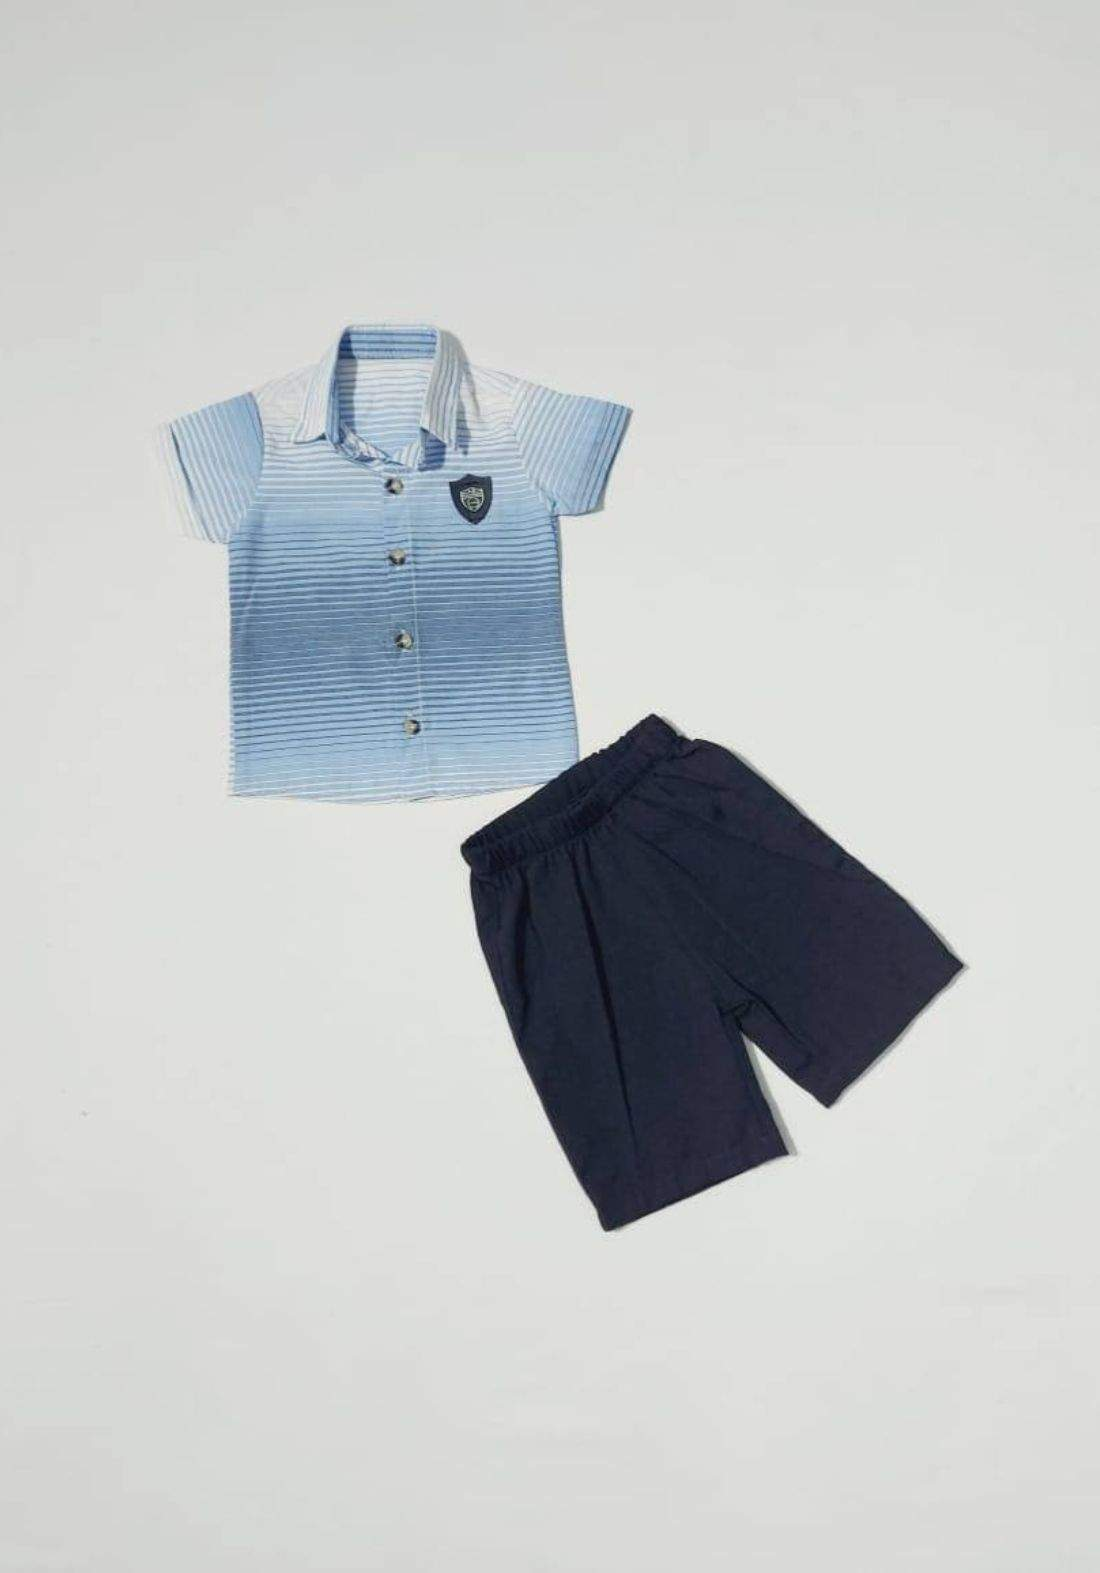 Boys' outfit (shirt and short) طقم ولادي (قميص وشورت )